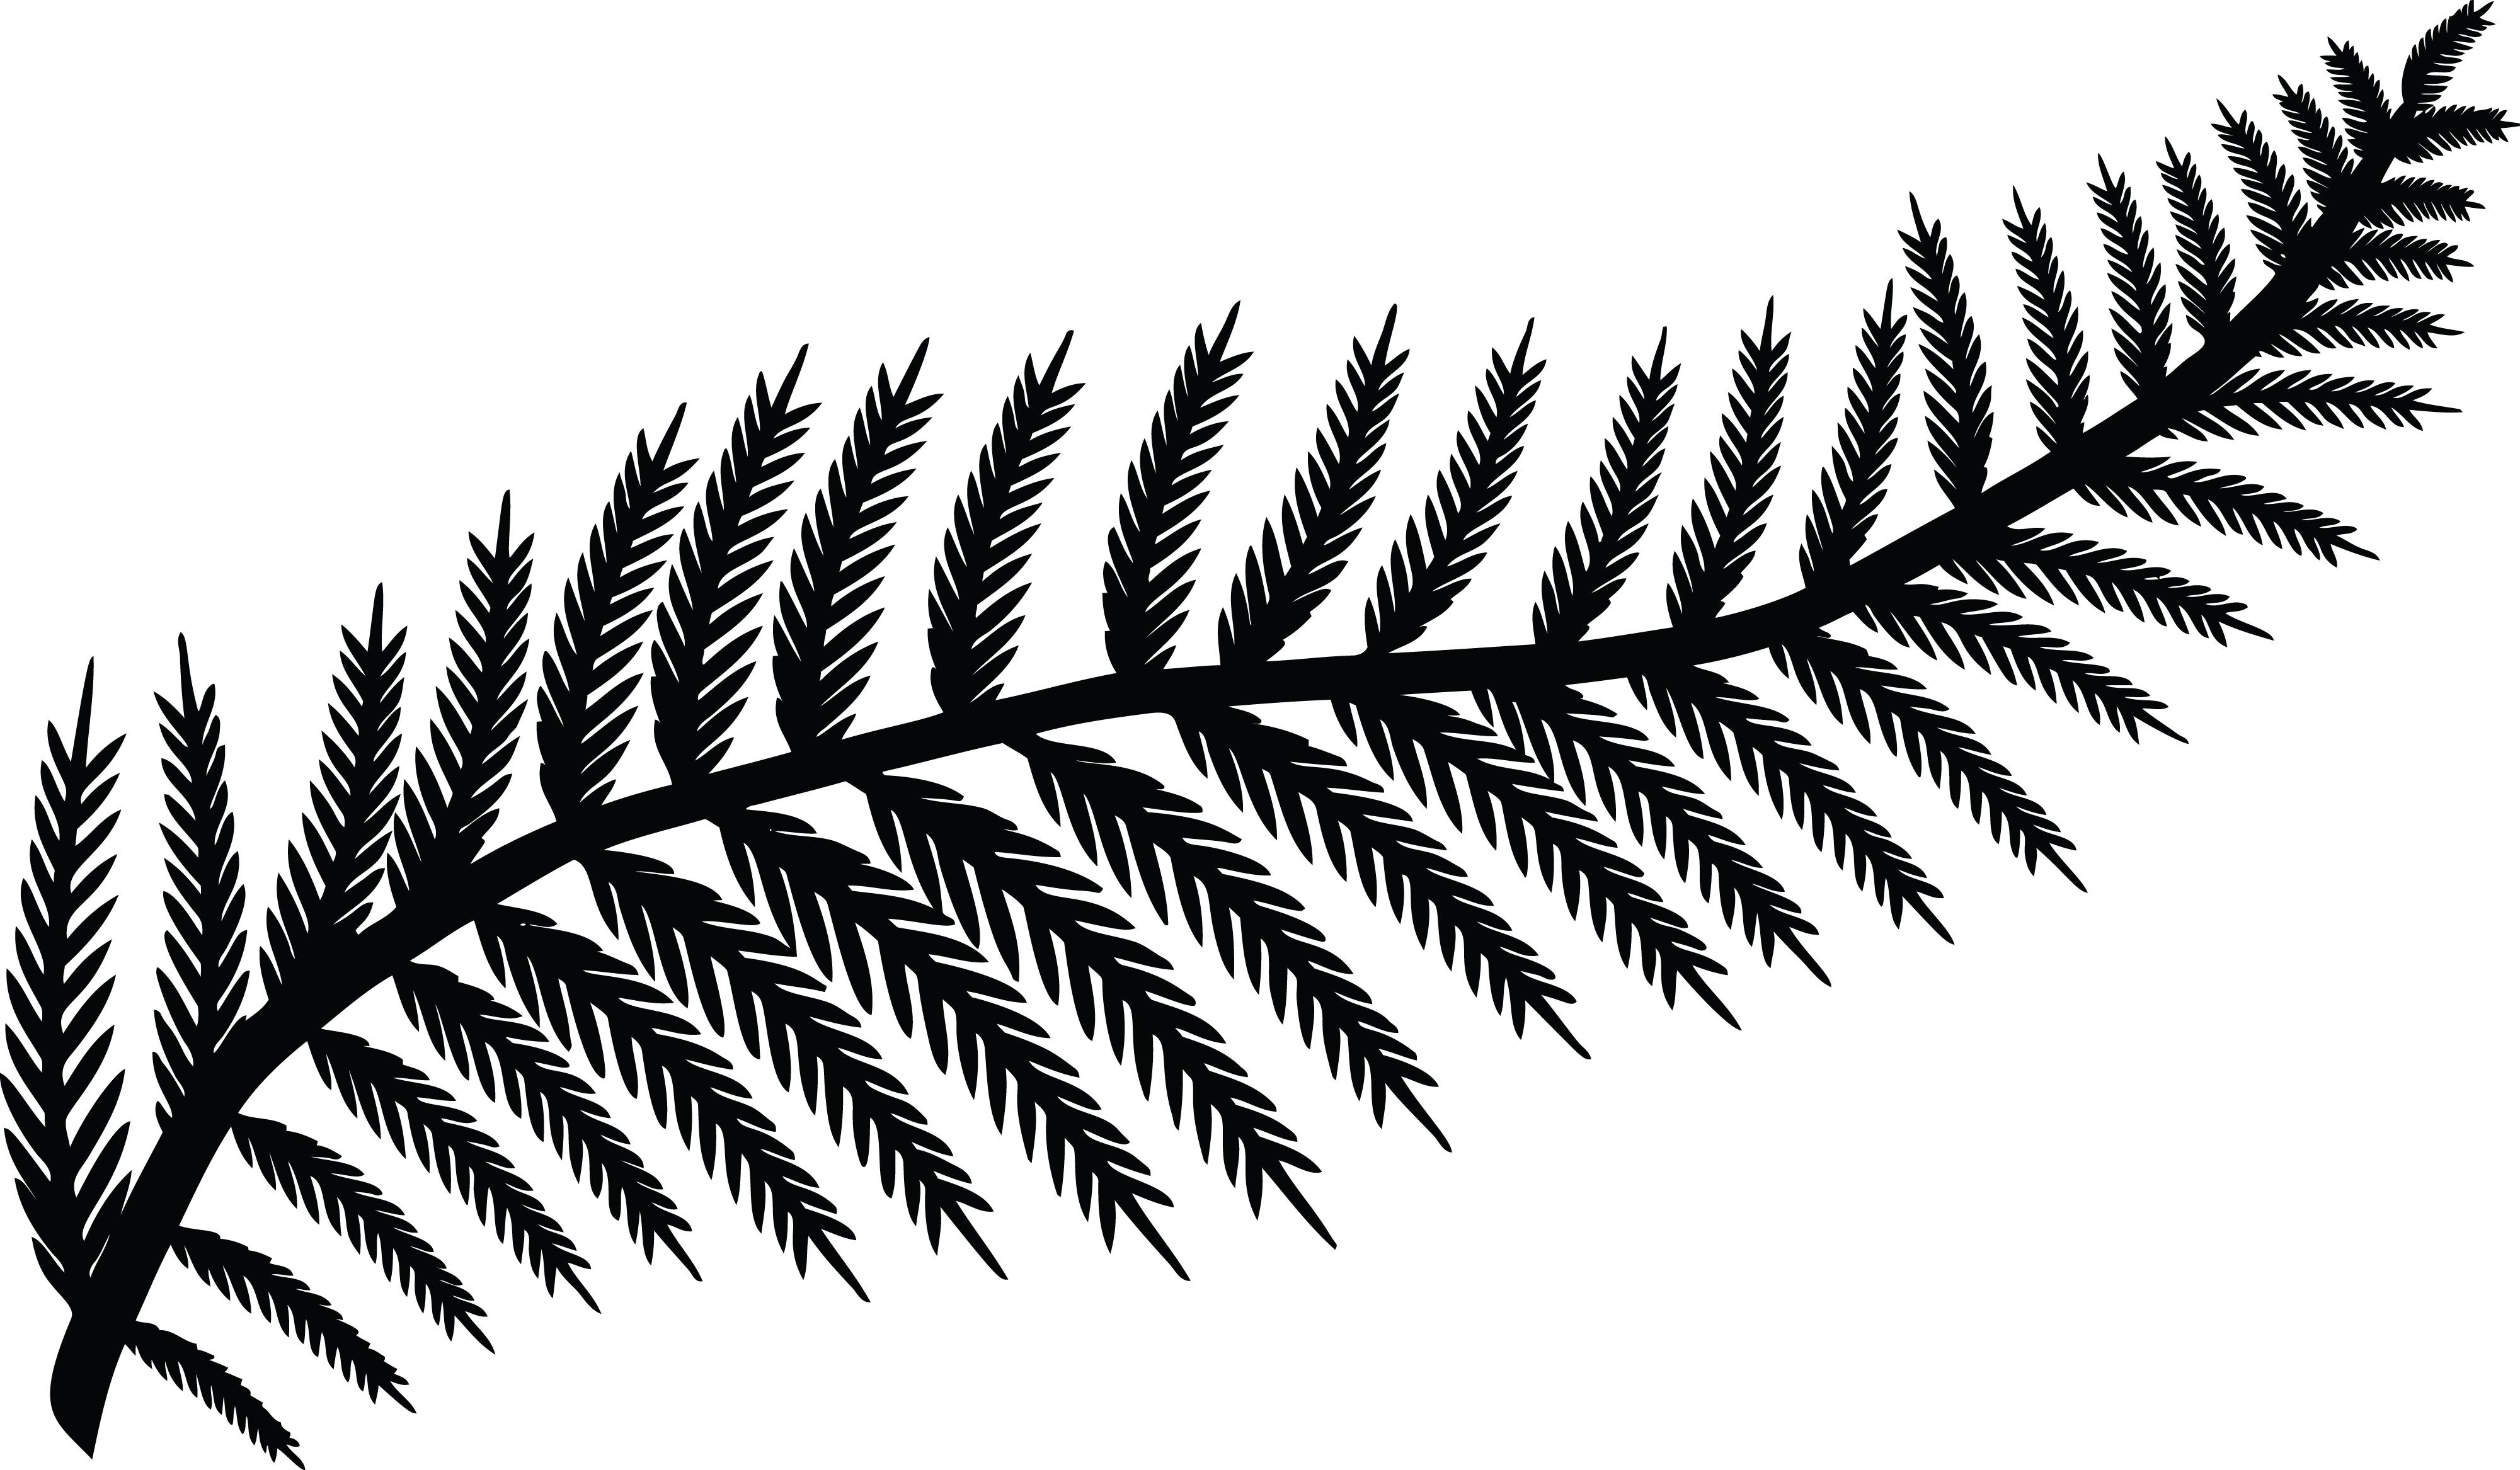 Free Clipart Of A fern leaf.